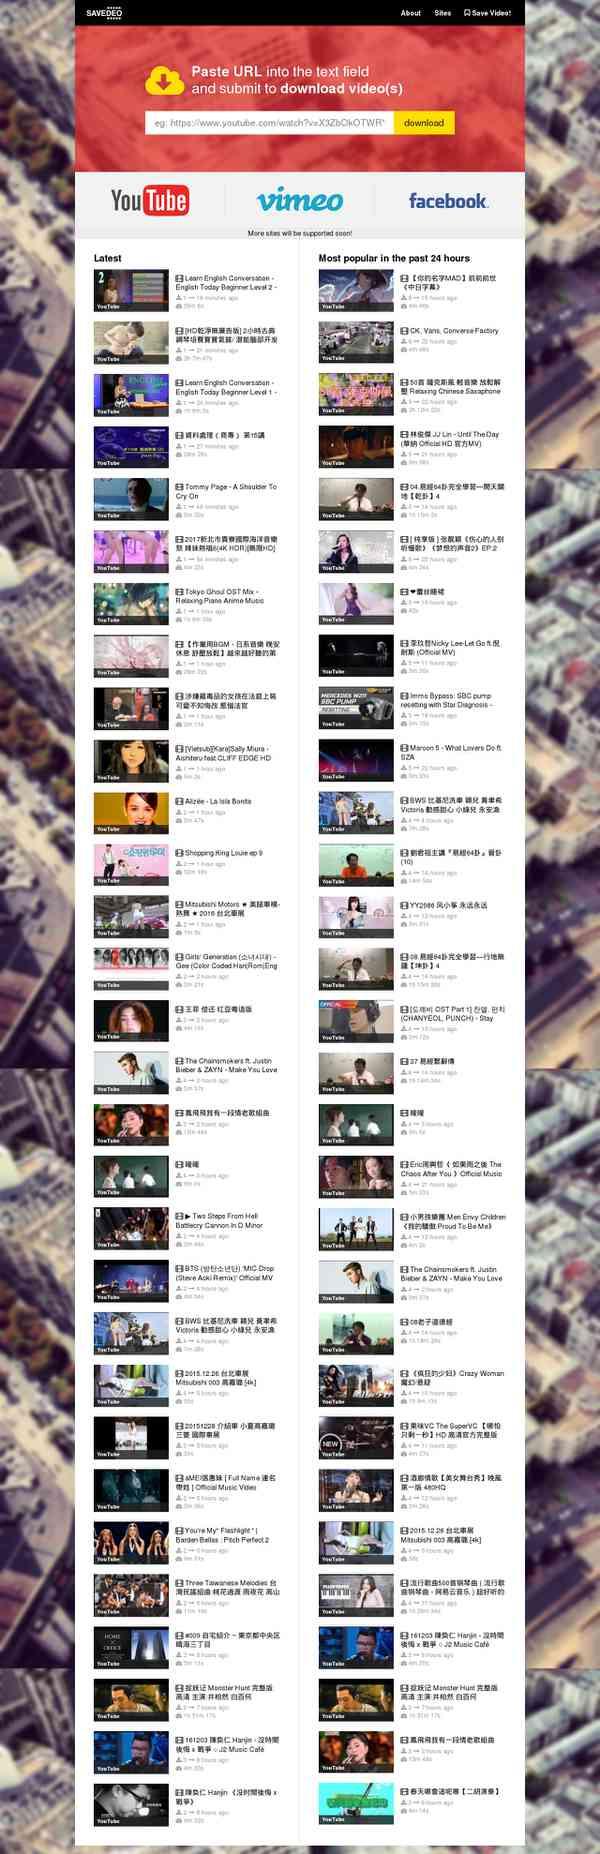 Savedeo The Easiest Way To Download Videos From Youtube Tumblr Dailymotion Vine Facebook Inst Herramientas Descargas Online